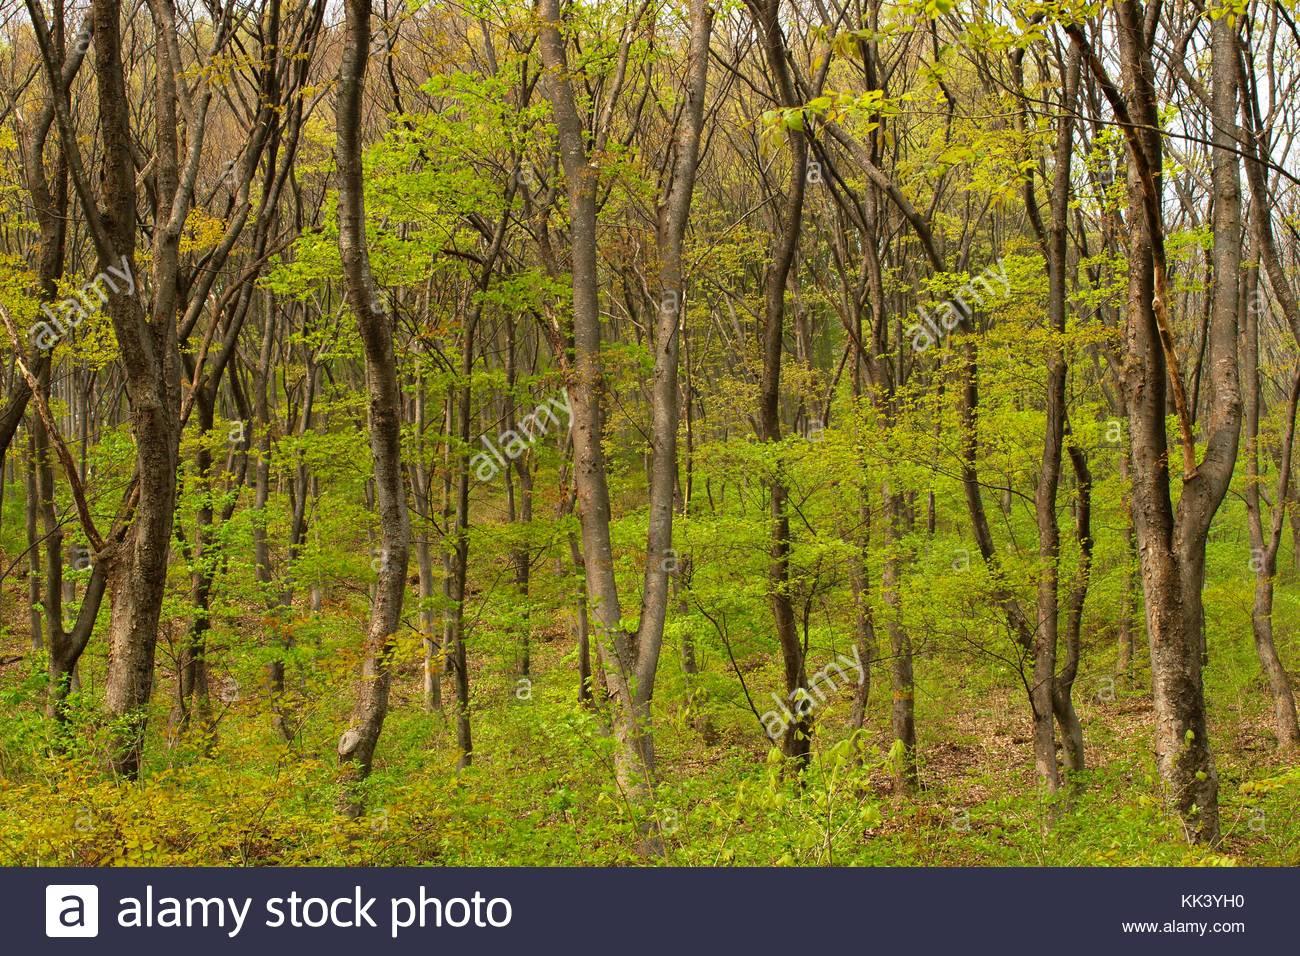 zelkova forest Korea National Arboretum Gwangneung Arboretum - Stock Image